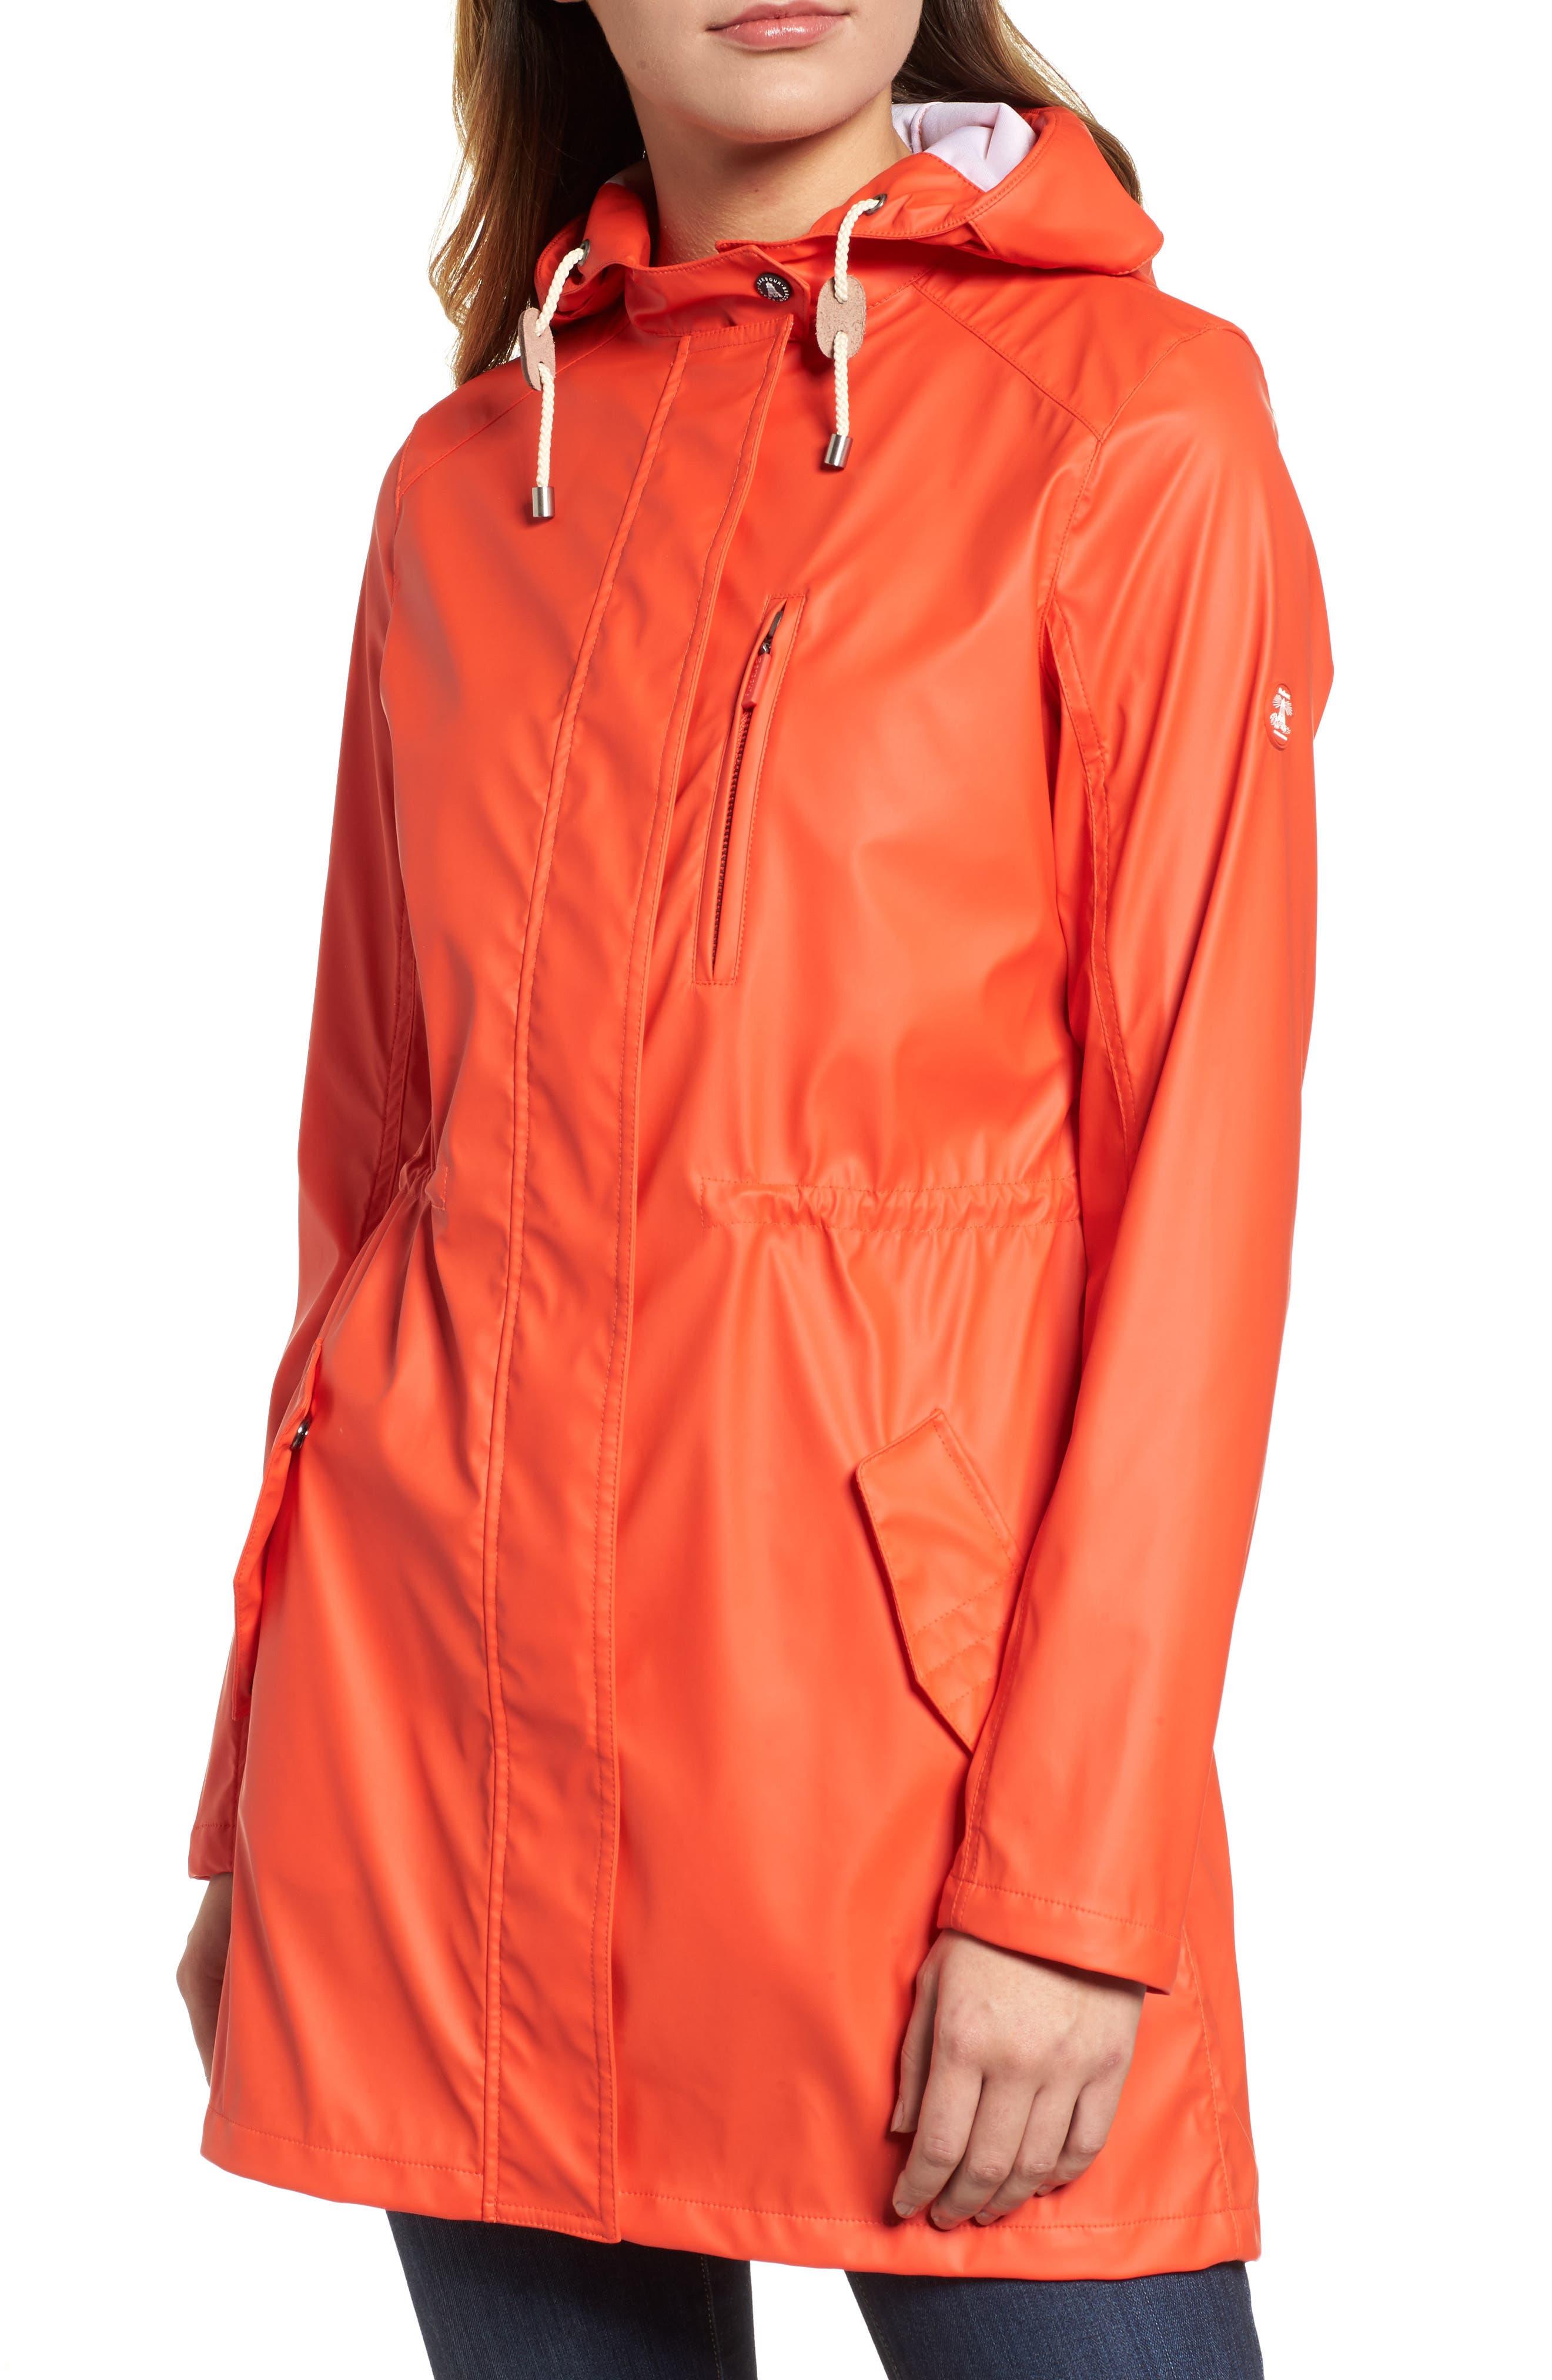 Harbour Hooded Jacket,                             Alternate thumbnail 4, color,                             Signal Orange